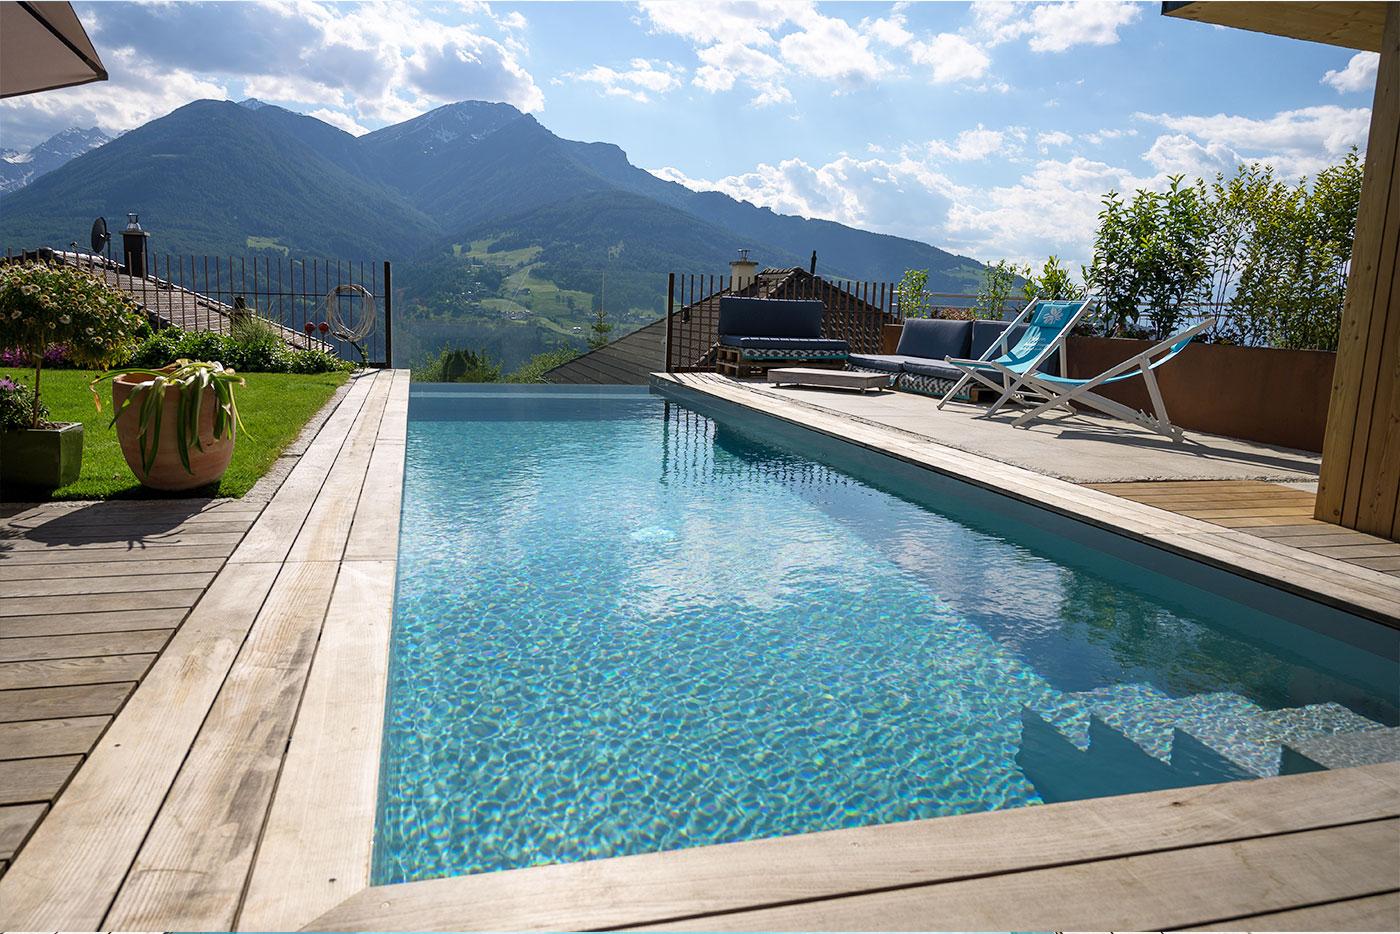 privat-a-niveko-sst-pool-referenz-02-saurwein-schwimmbad-technik